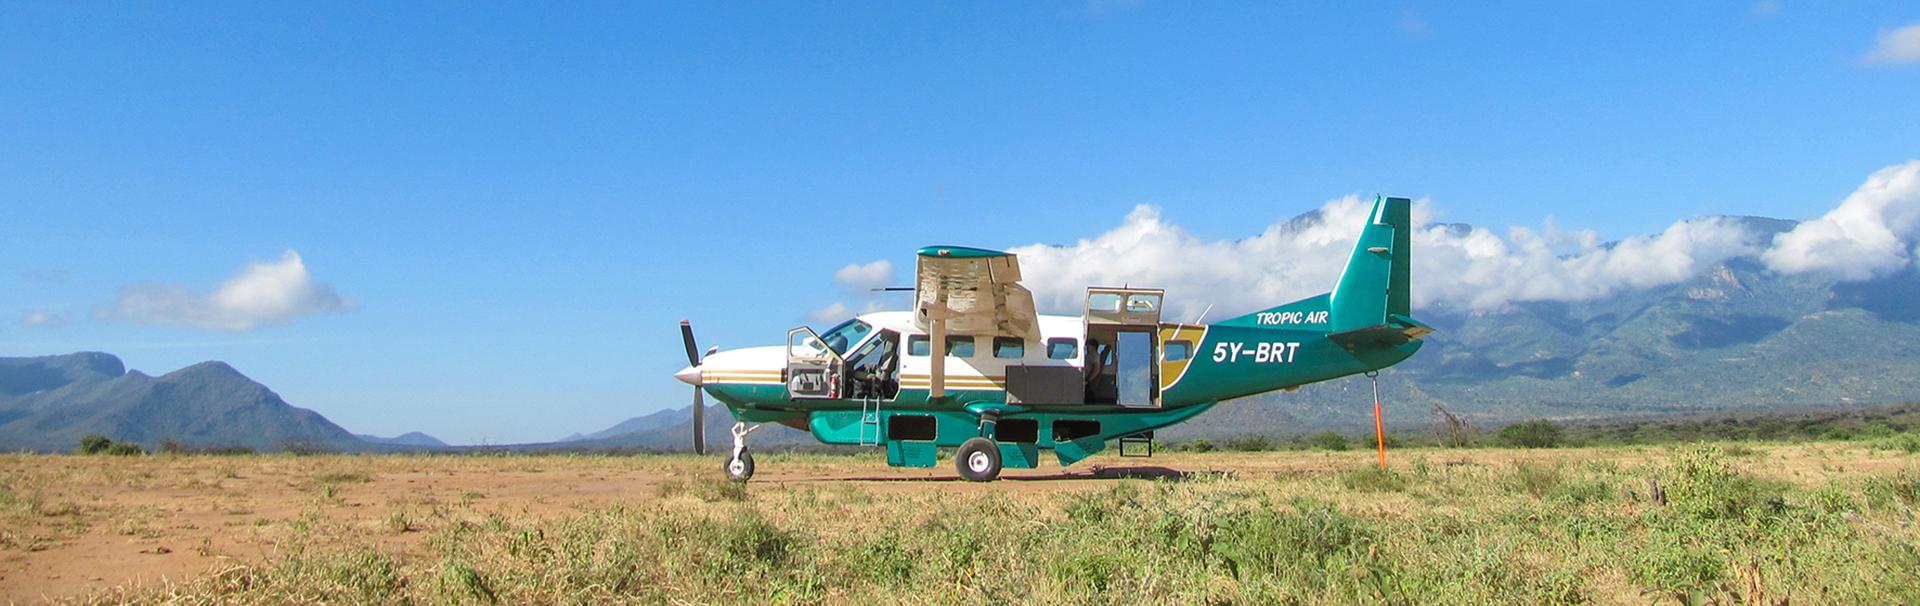 Cessna Caravan, @ Tim Mwangi